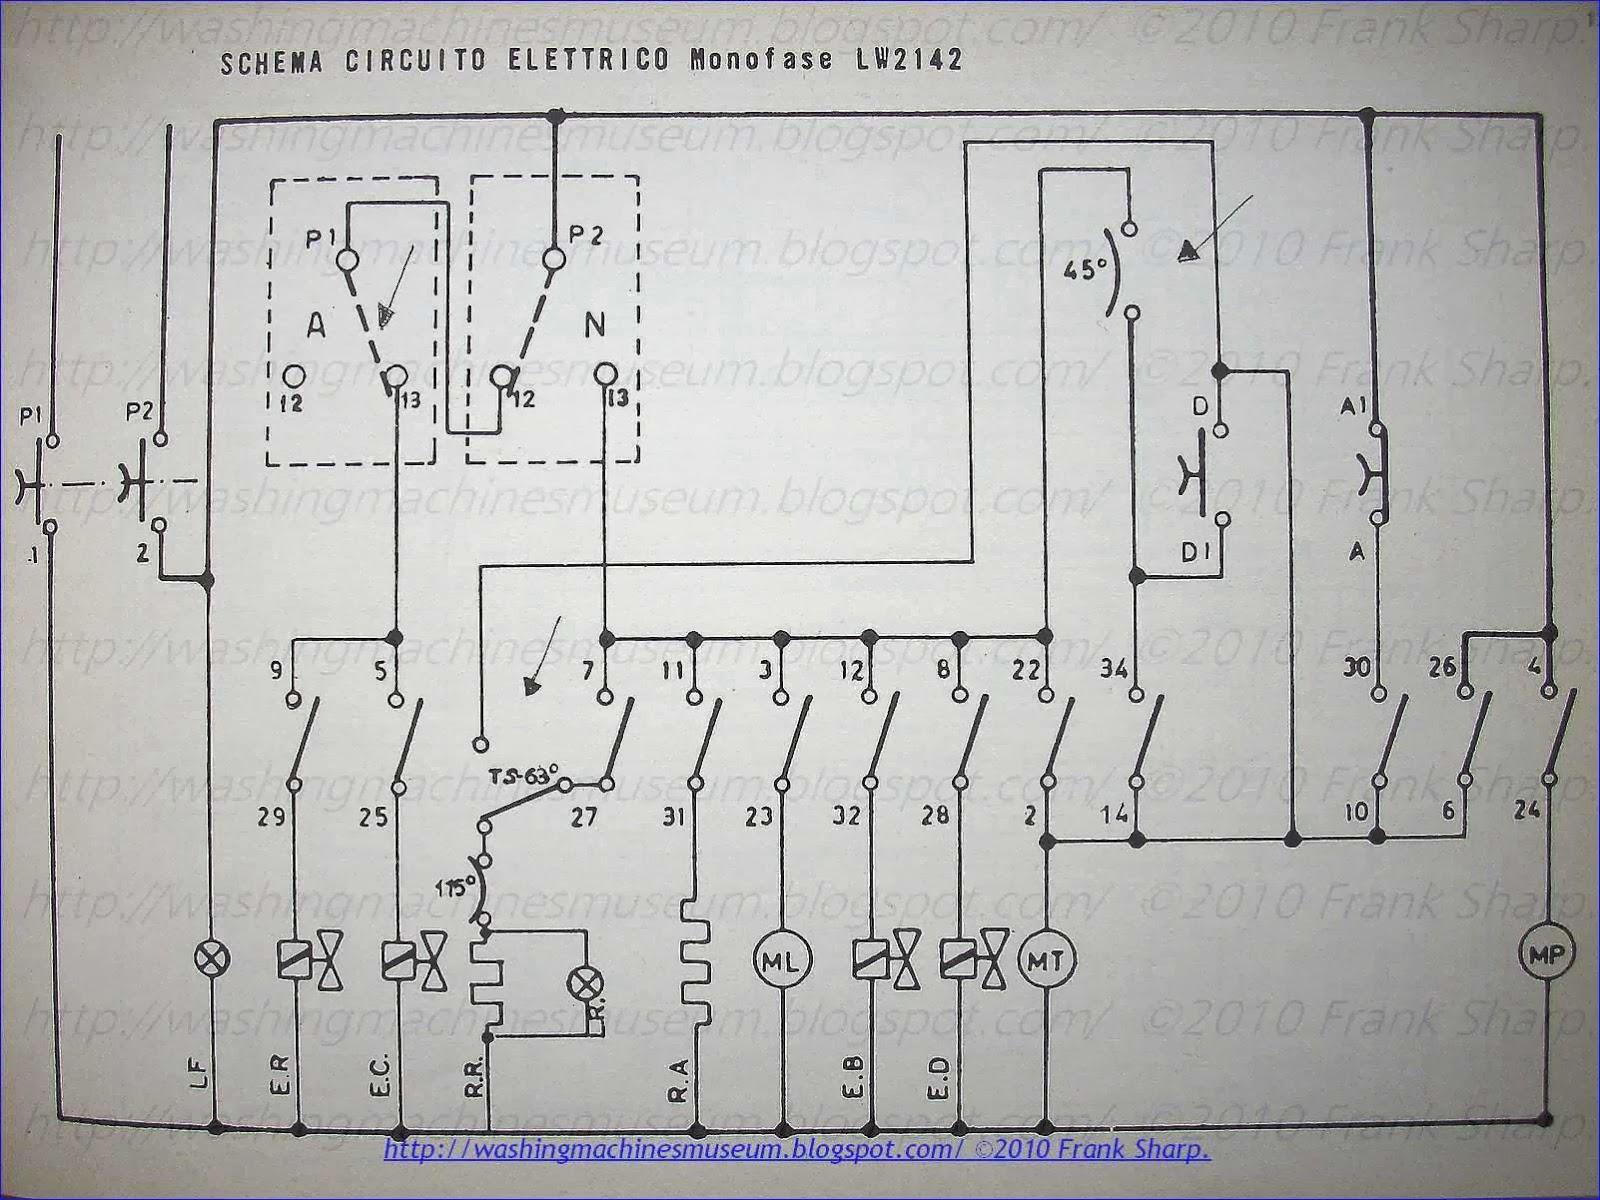 wrg 4272 philco refrigerator wiring diagram philco lw2142 lw2142 a lw2142 b schematic diagram [ 1600 x 1200 Pixel ]